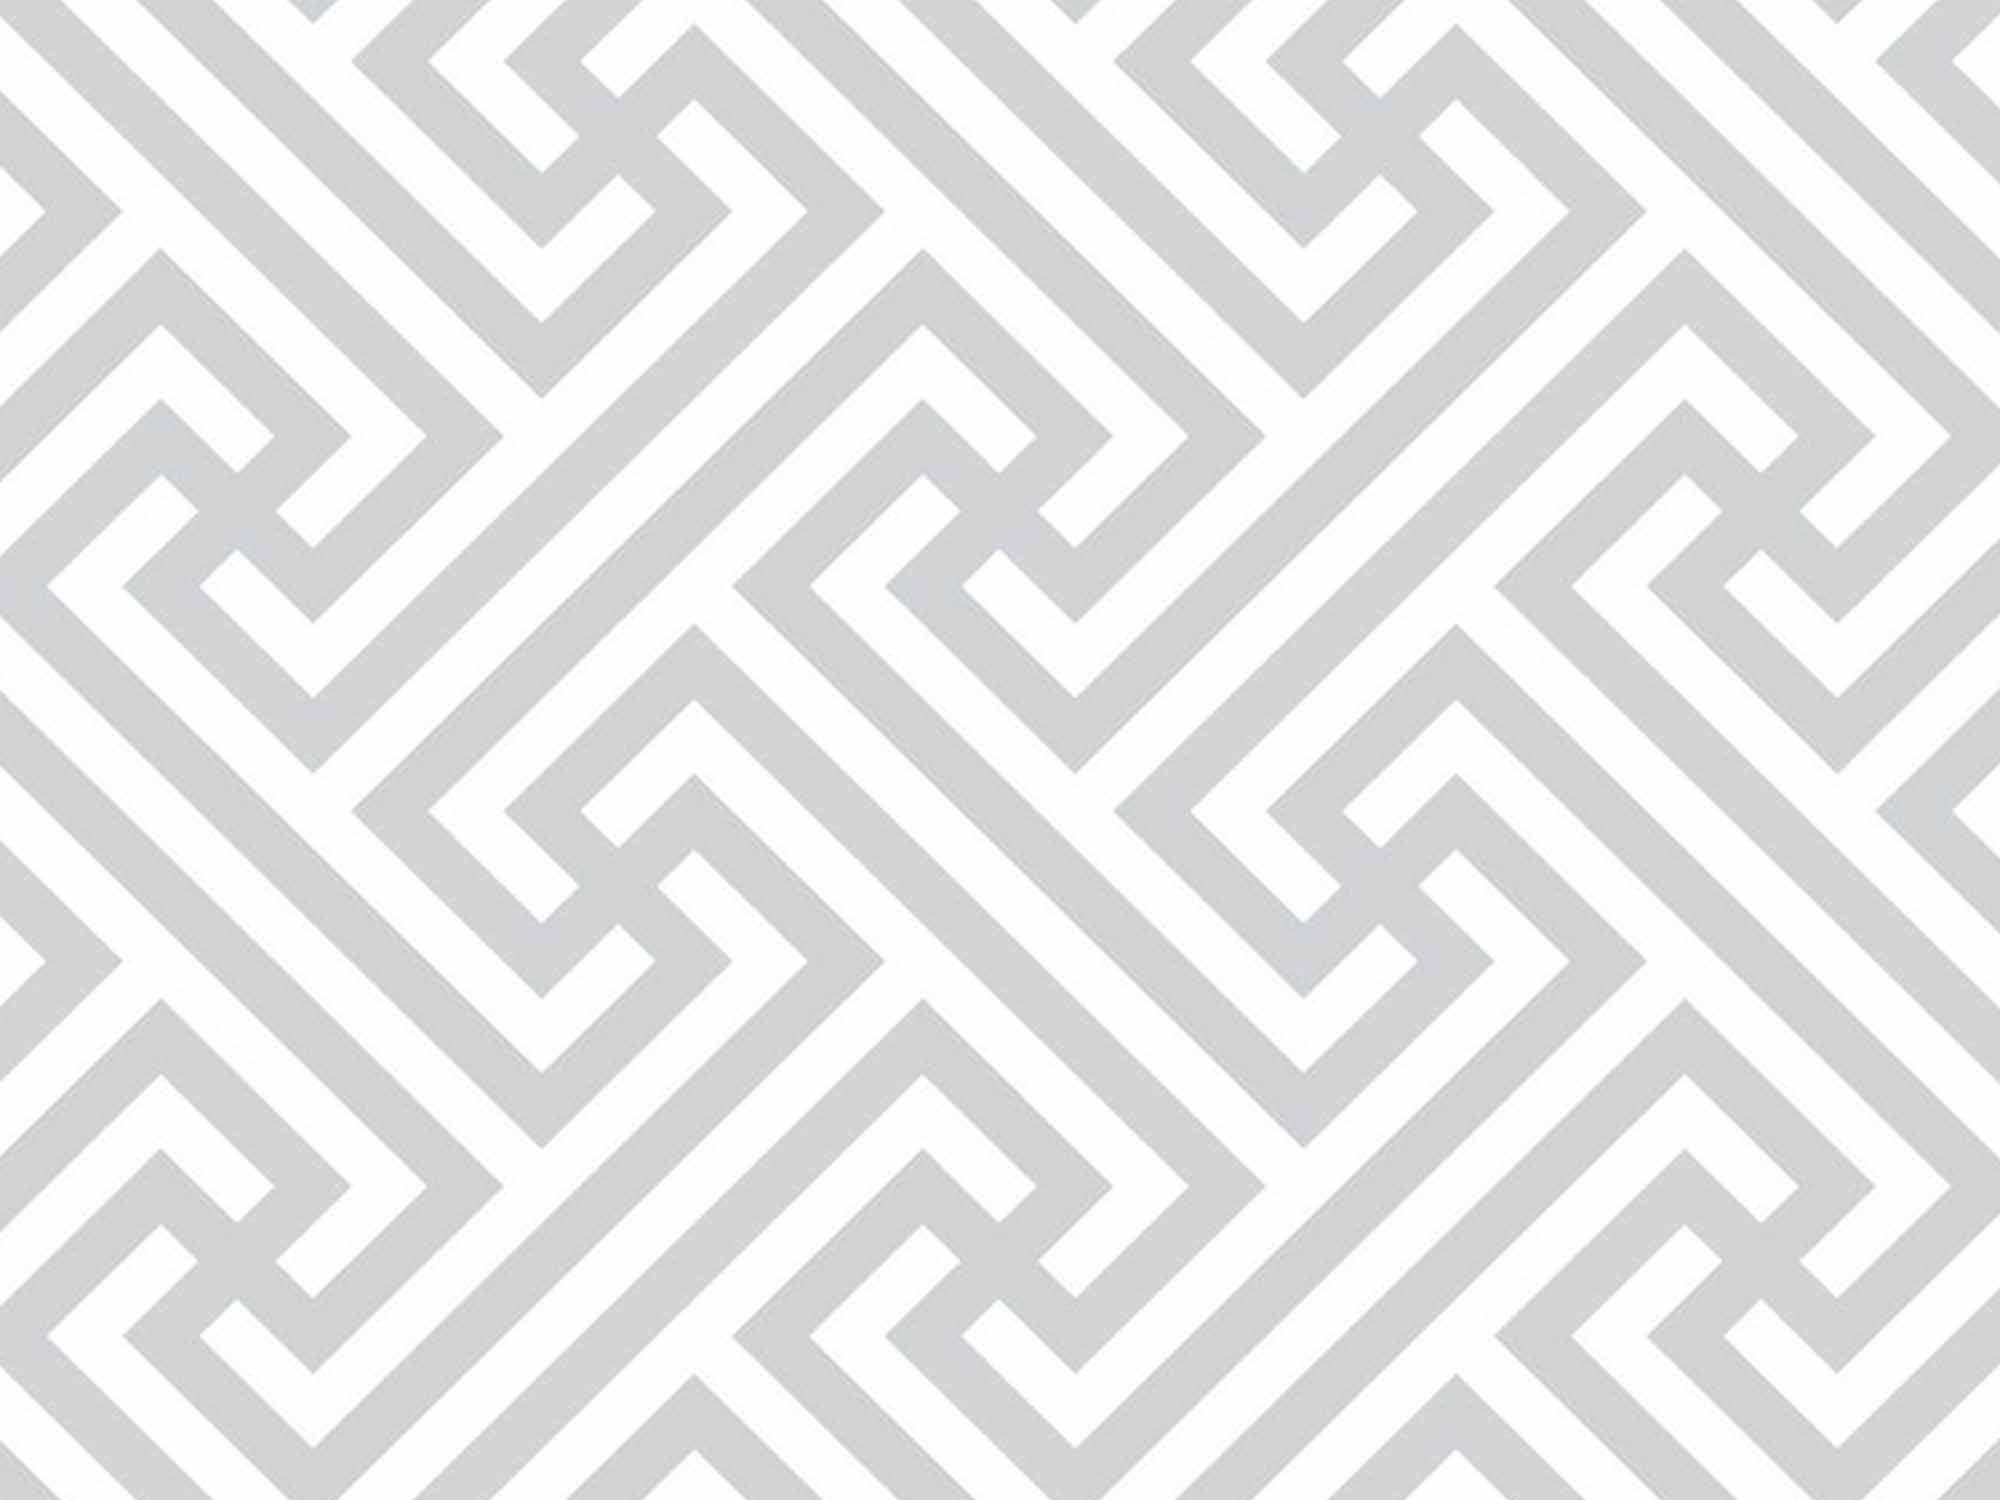 Papel de Parede para Sala Geométrico 0026 - Adesivos de Parede  - Paredes Decoradas